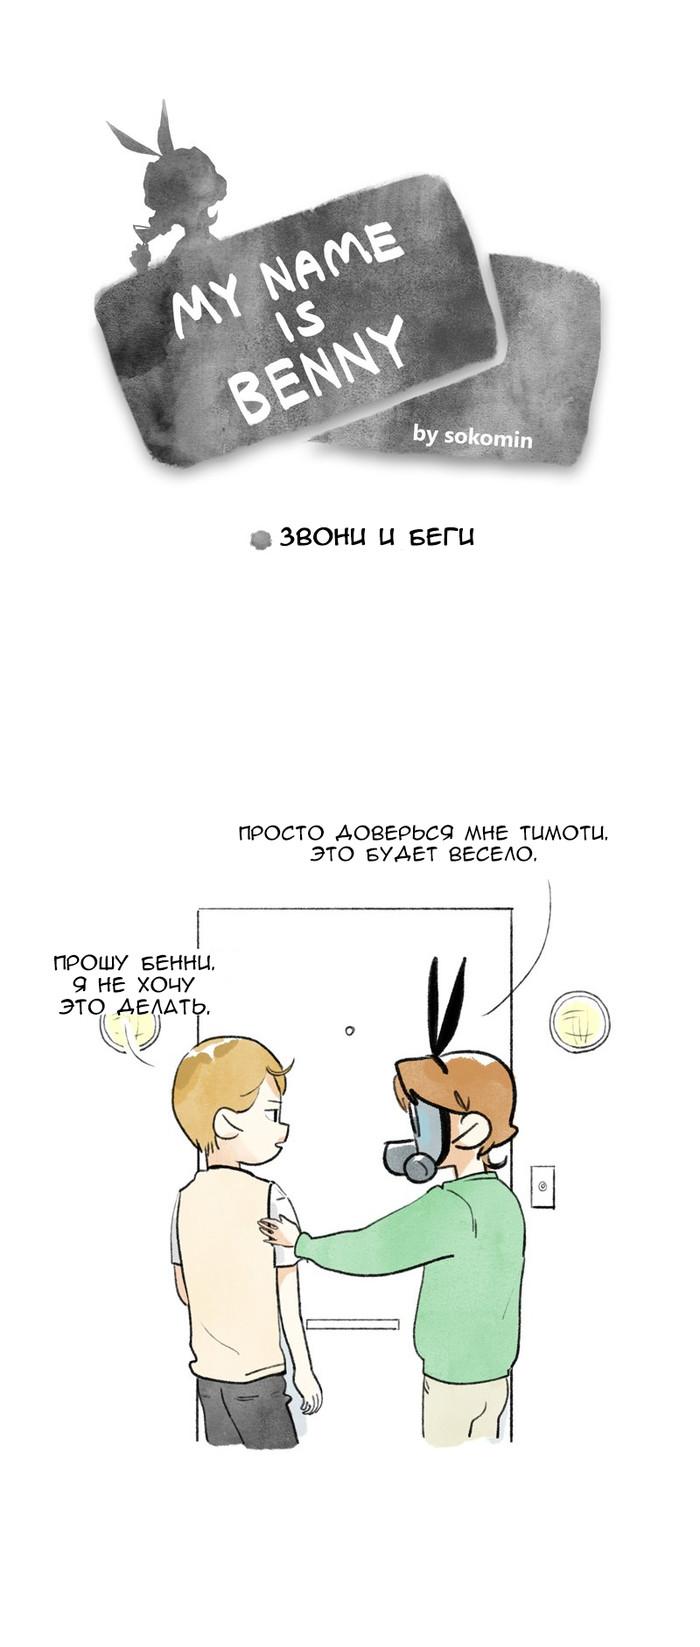 My name is Benny (Ep.49) Sokomin, Mnib, Перевел сам, Комиксы, Длиннопост